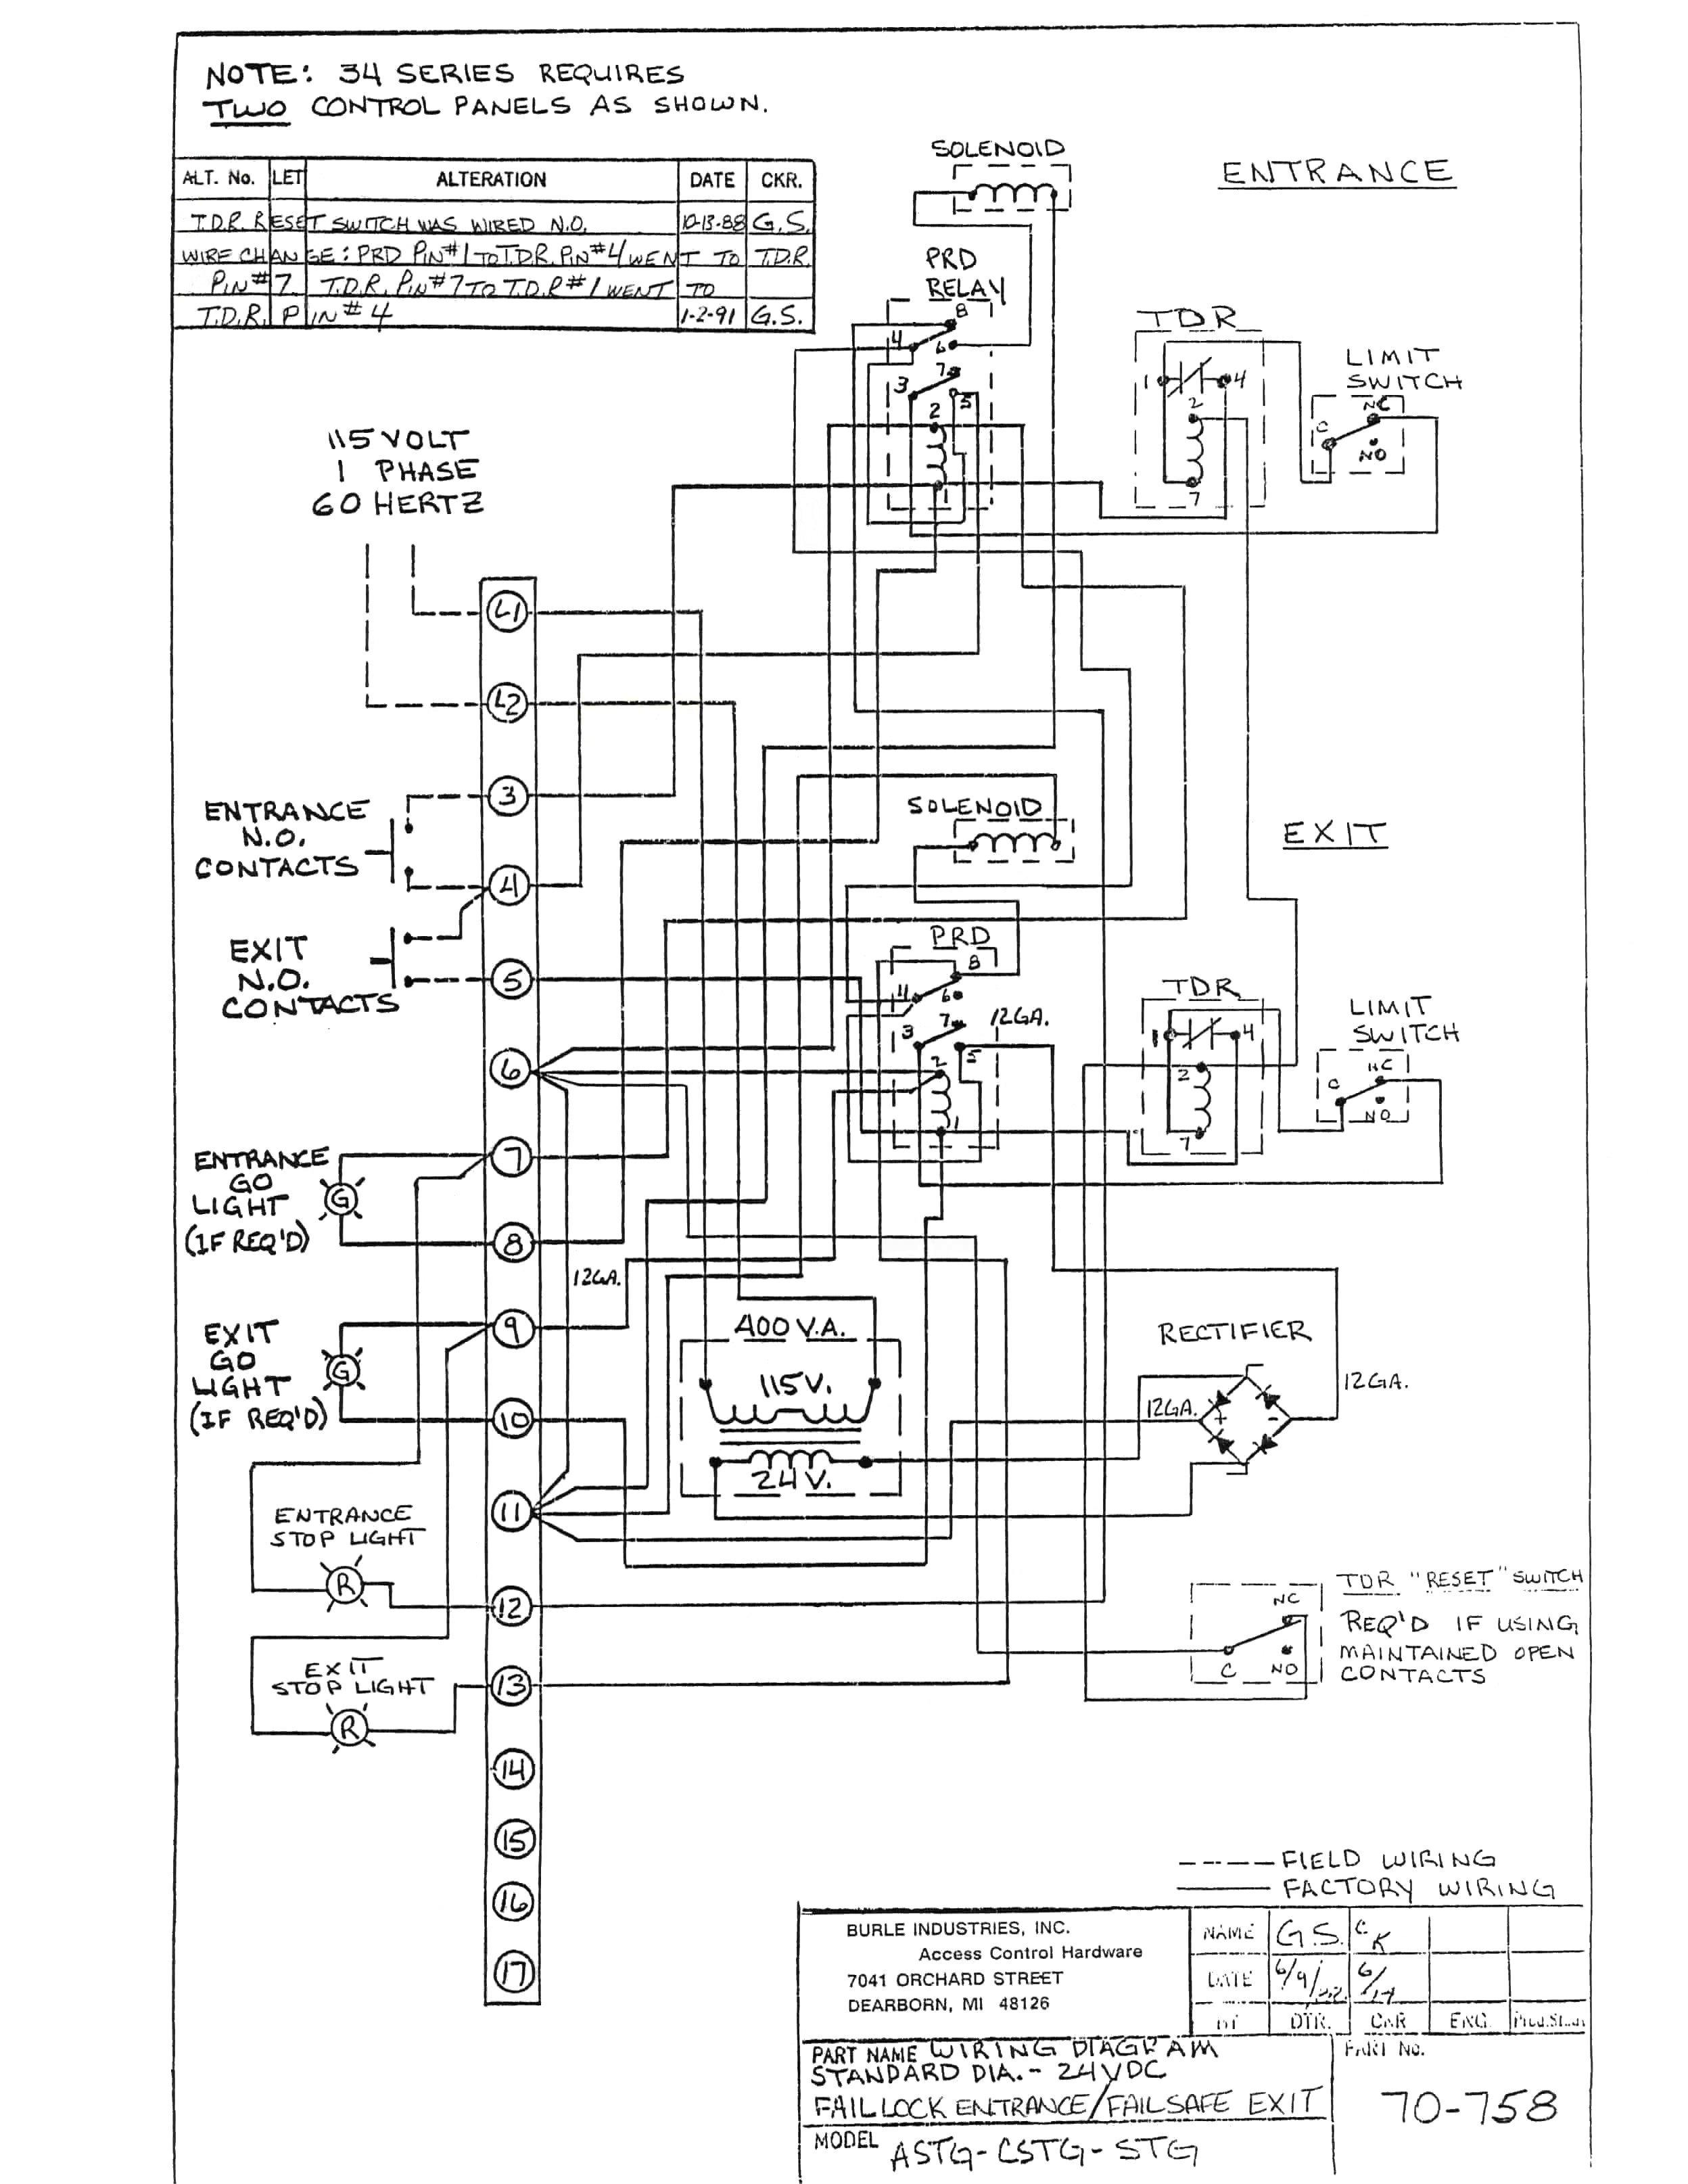 STG Relay Schematic w Time Delay?resize\\\\\\\\\\\\\\\\\\\\\\\\\\\\\\\\\\\\\\\\\\\\\\\=665%2C860 trane xr90 wiring diagram trane xr90 owners manual \u2022 wiring trane weathertron thermostat wiring diagram at gsmportal.co